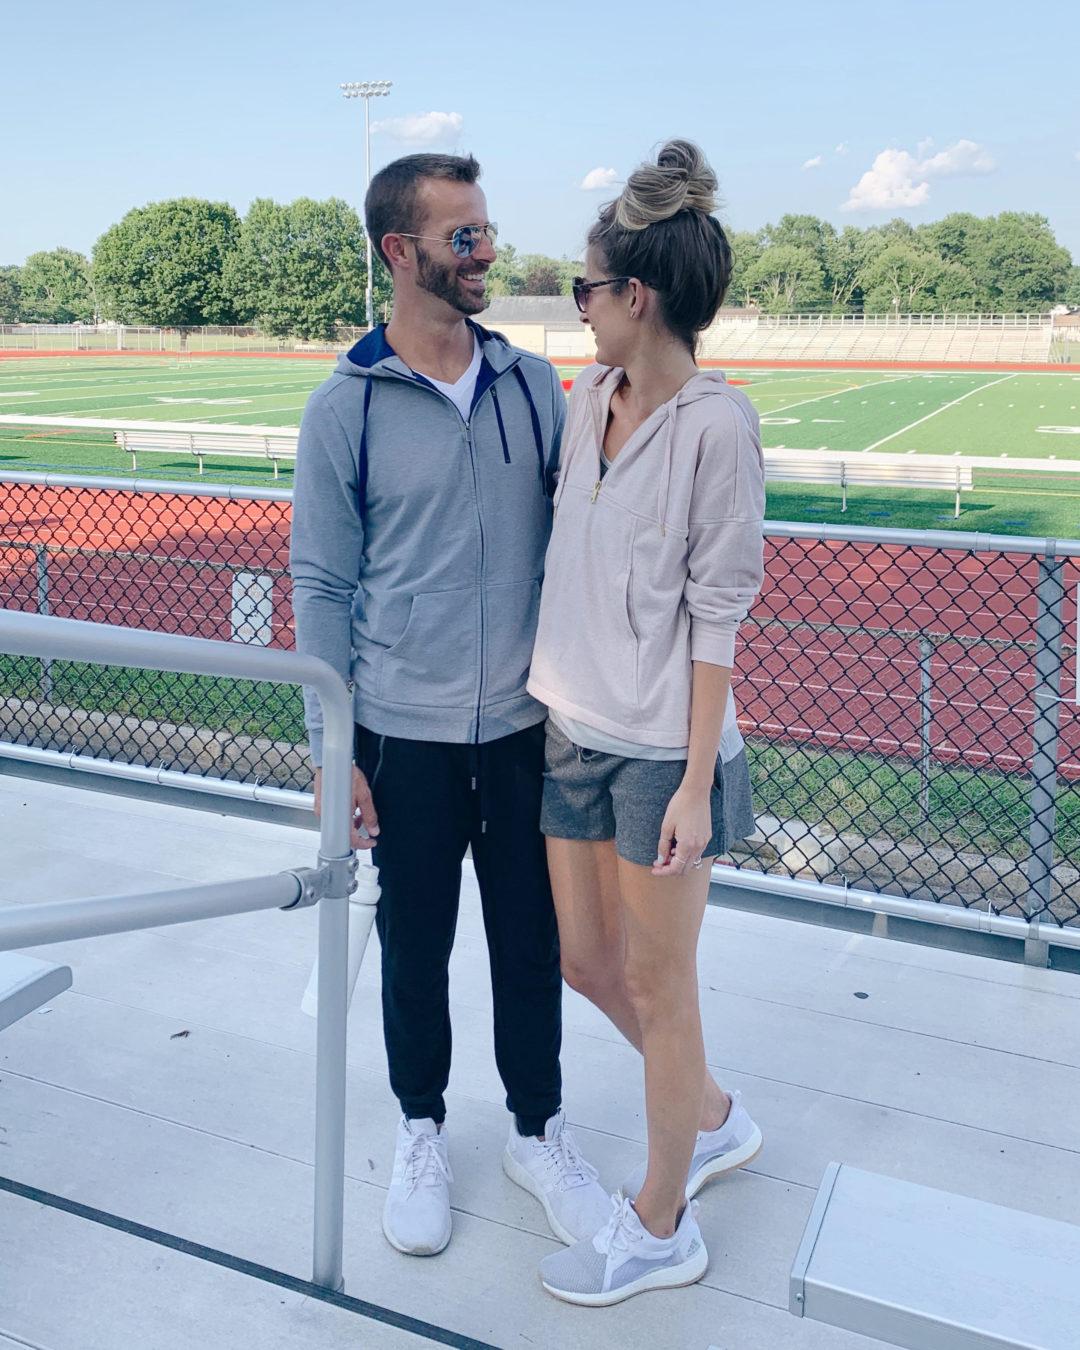 pinteresting-plans-jockey-couples-workout-outfits